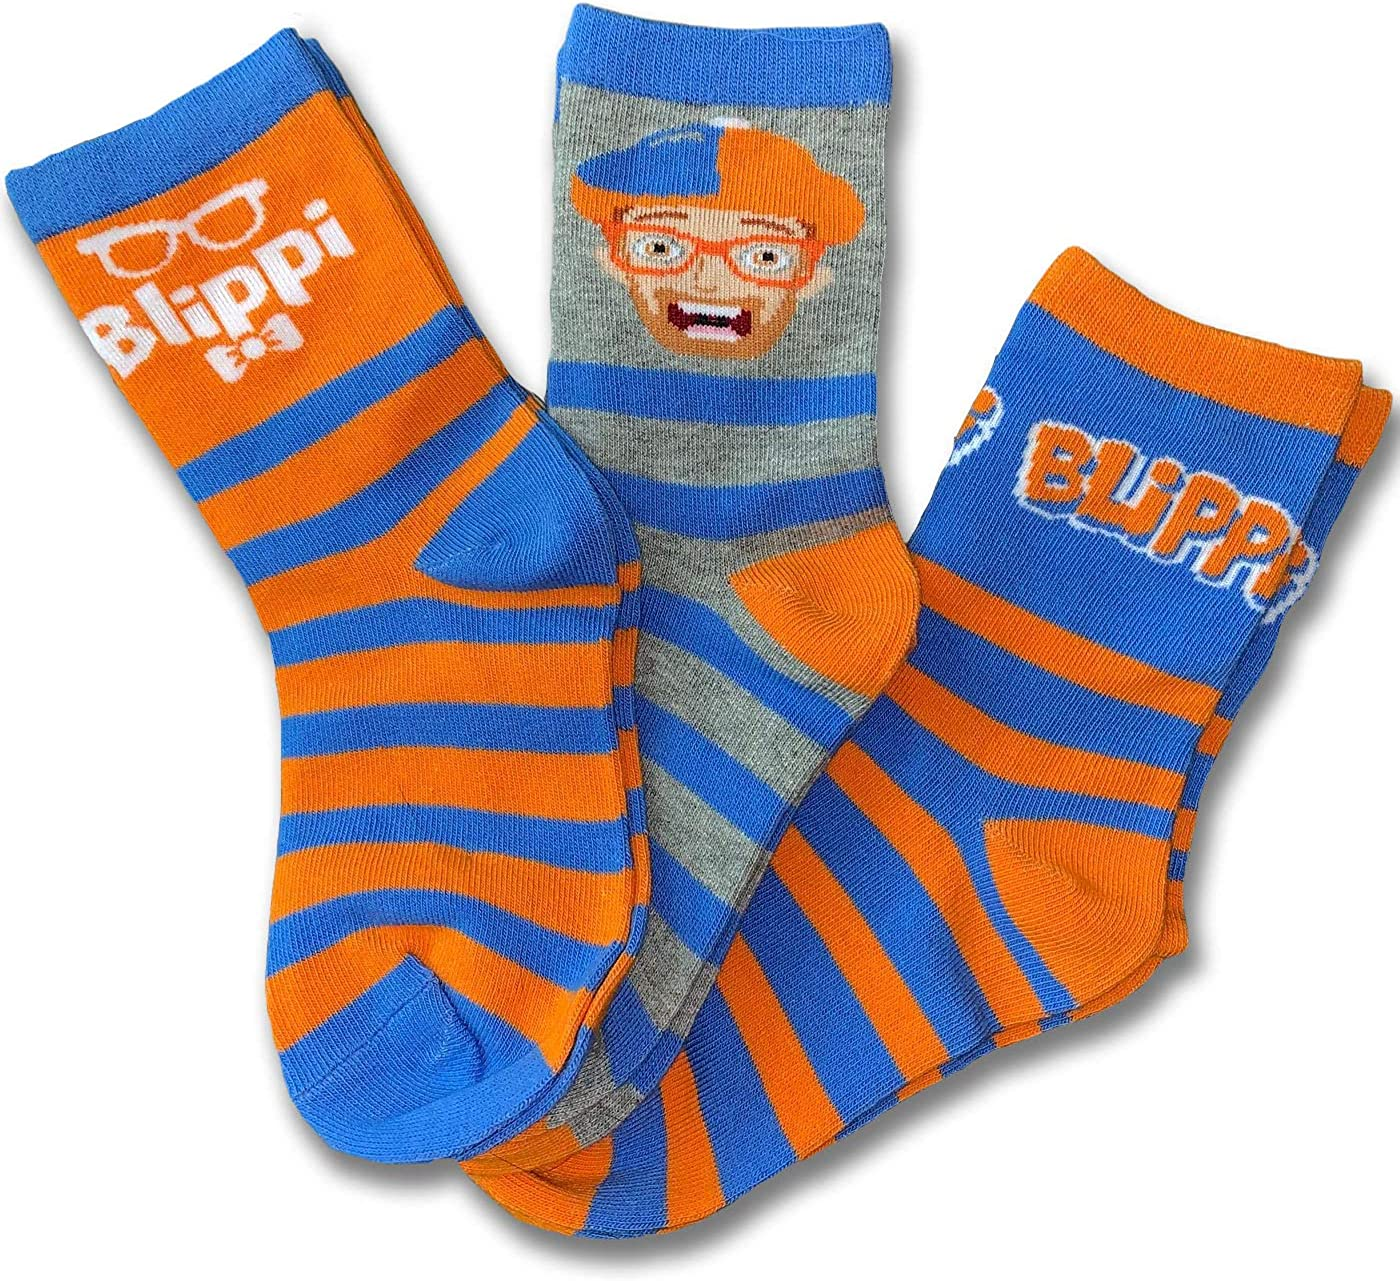 Amazon.com: Blippi Childrens Socks